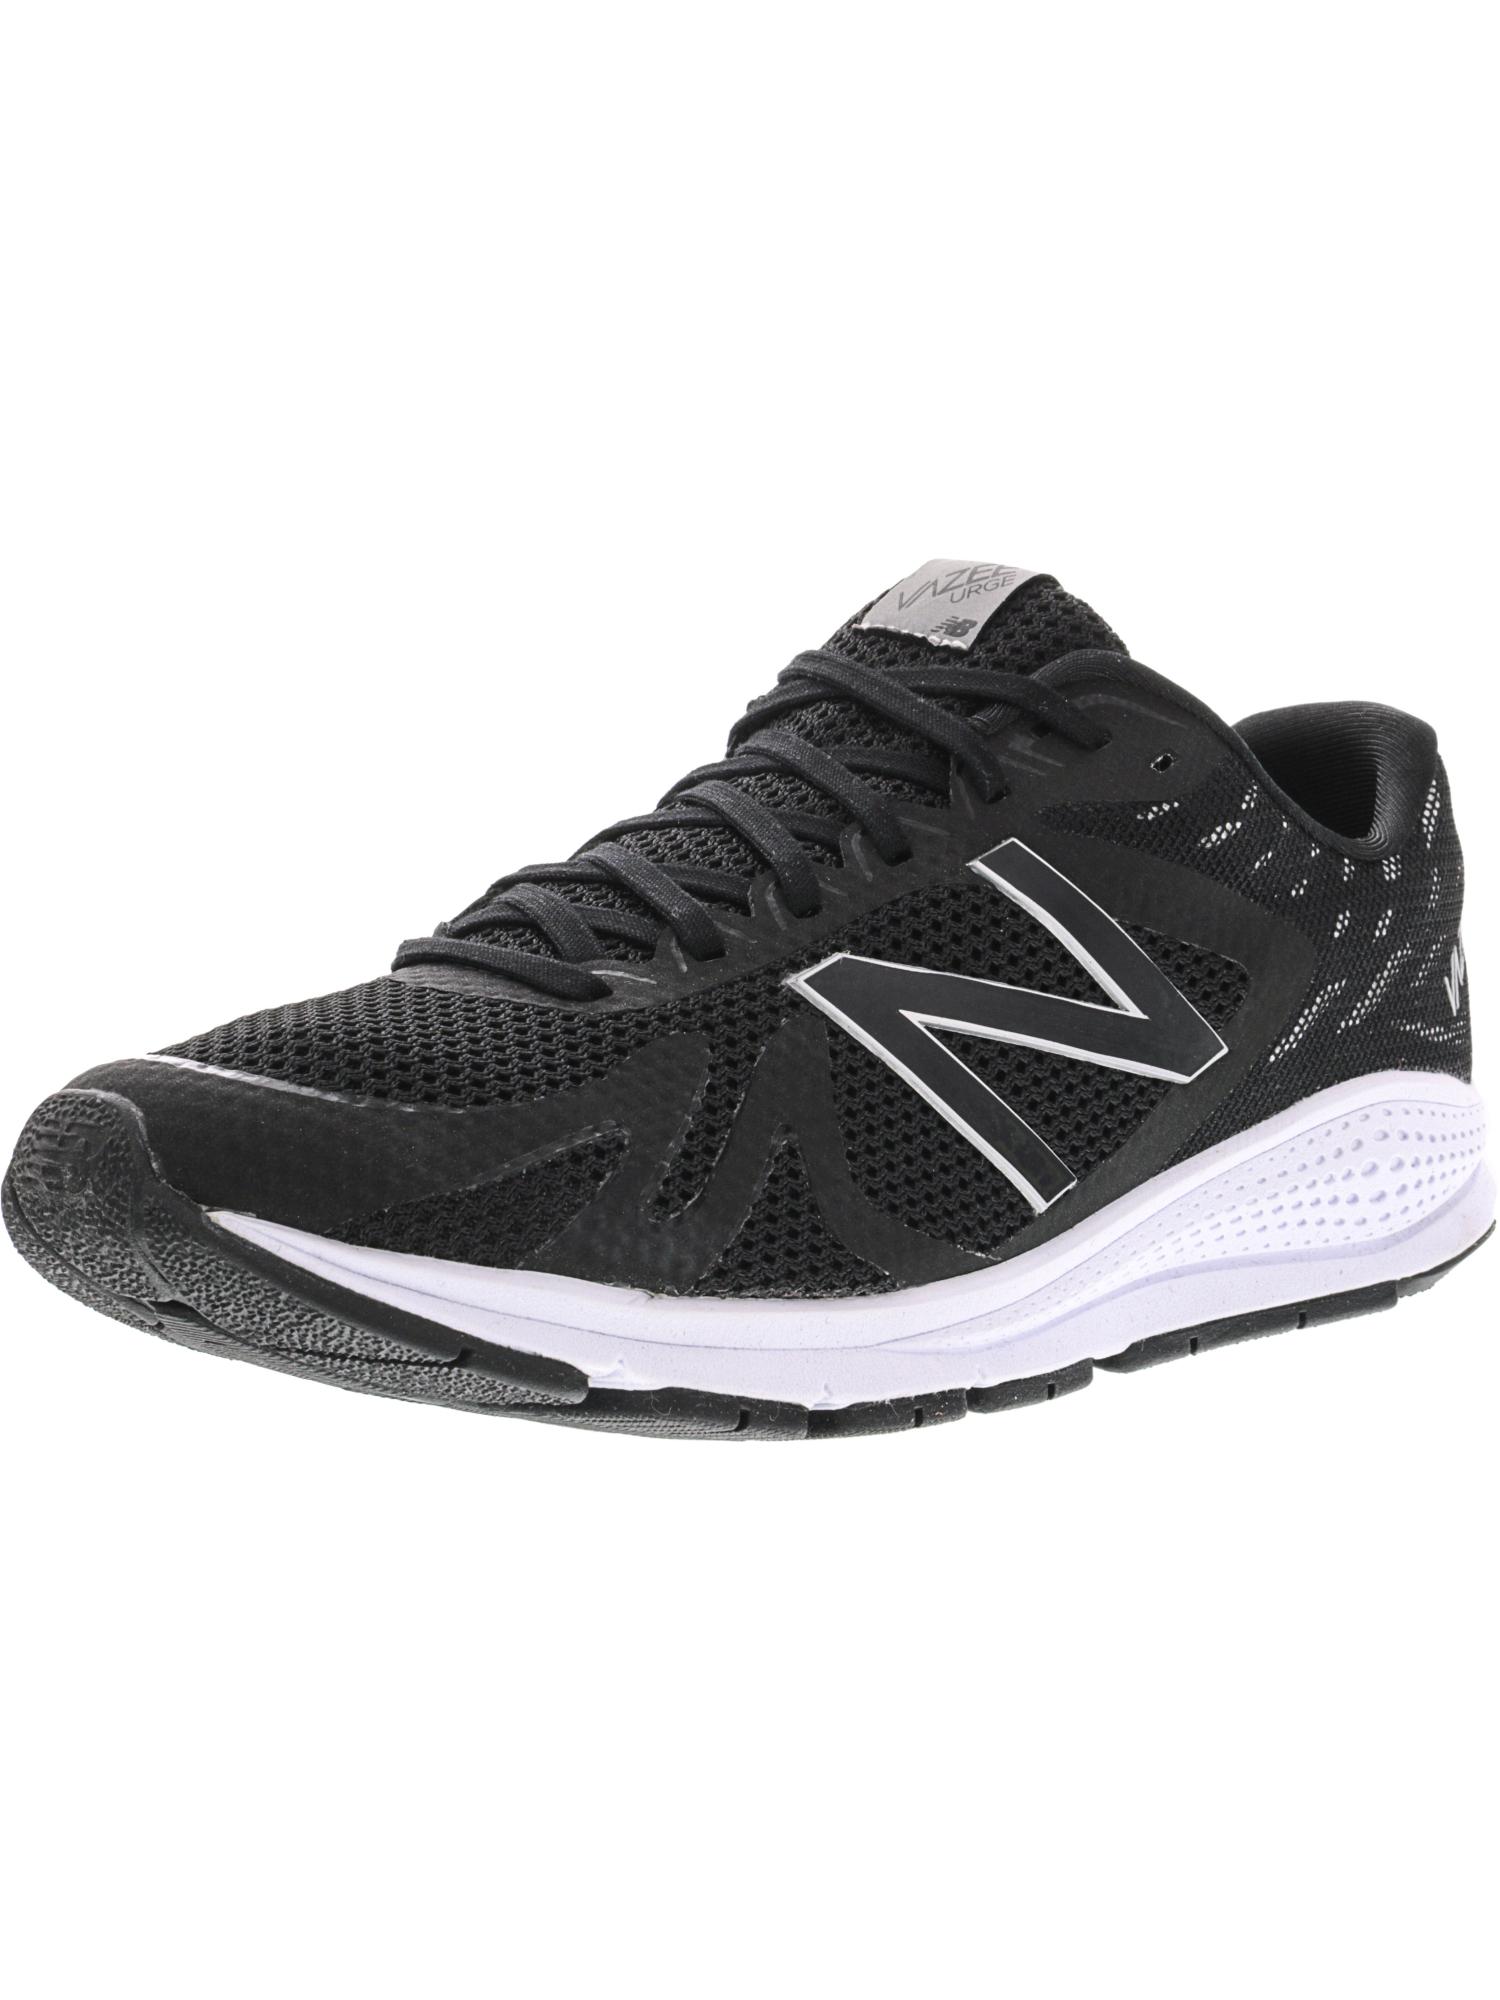 reputable site 28eec 22de0 ... New New New Balance Men s Murge Ankle-High Running Shoe 7f8830